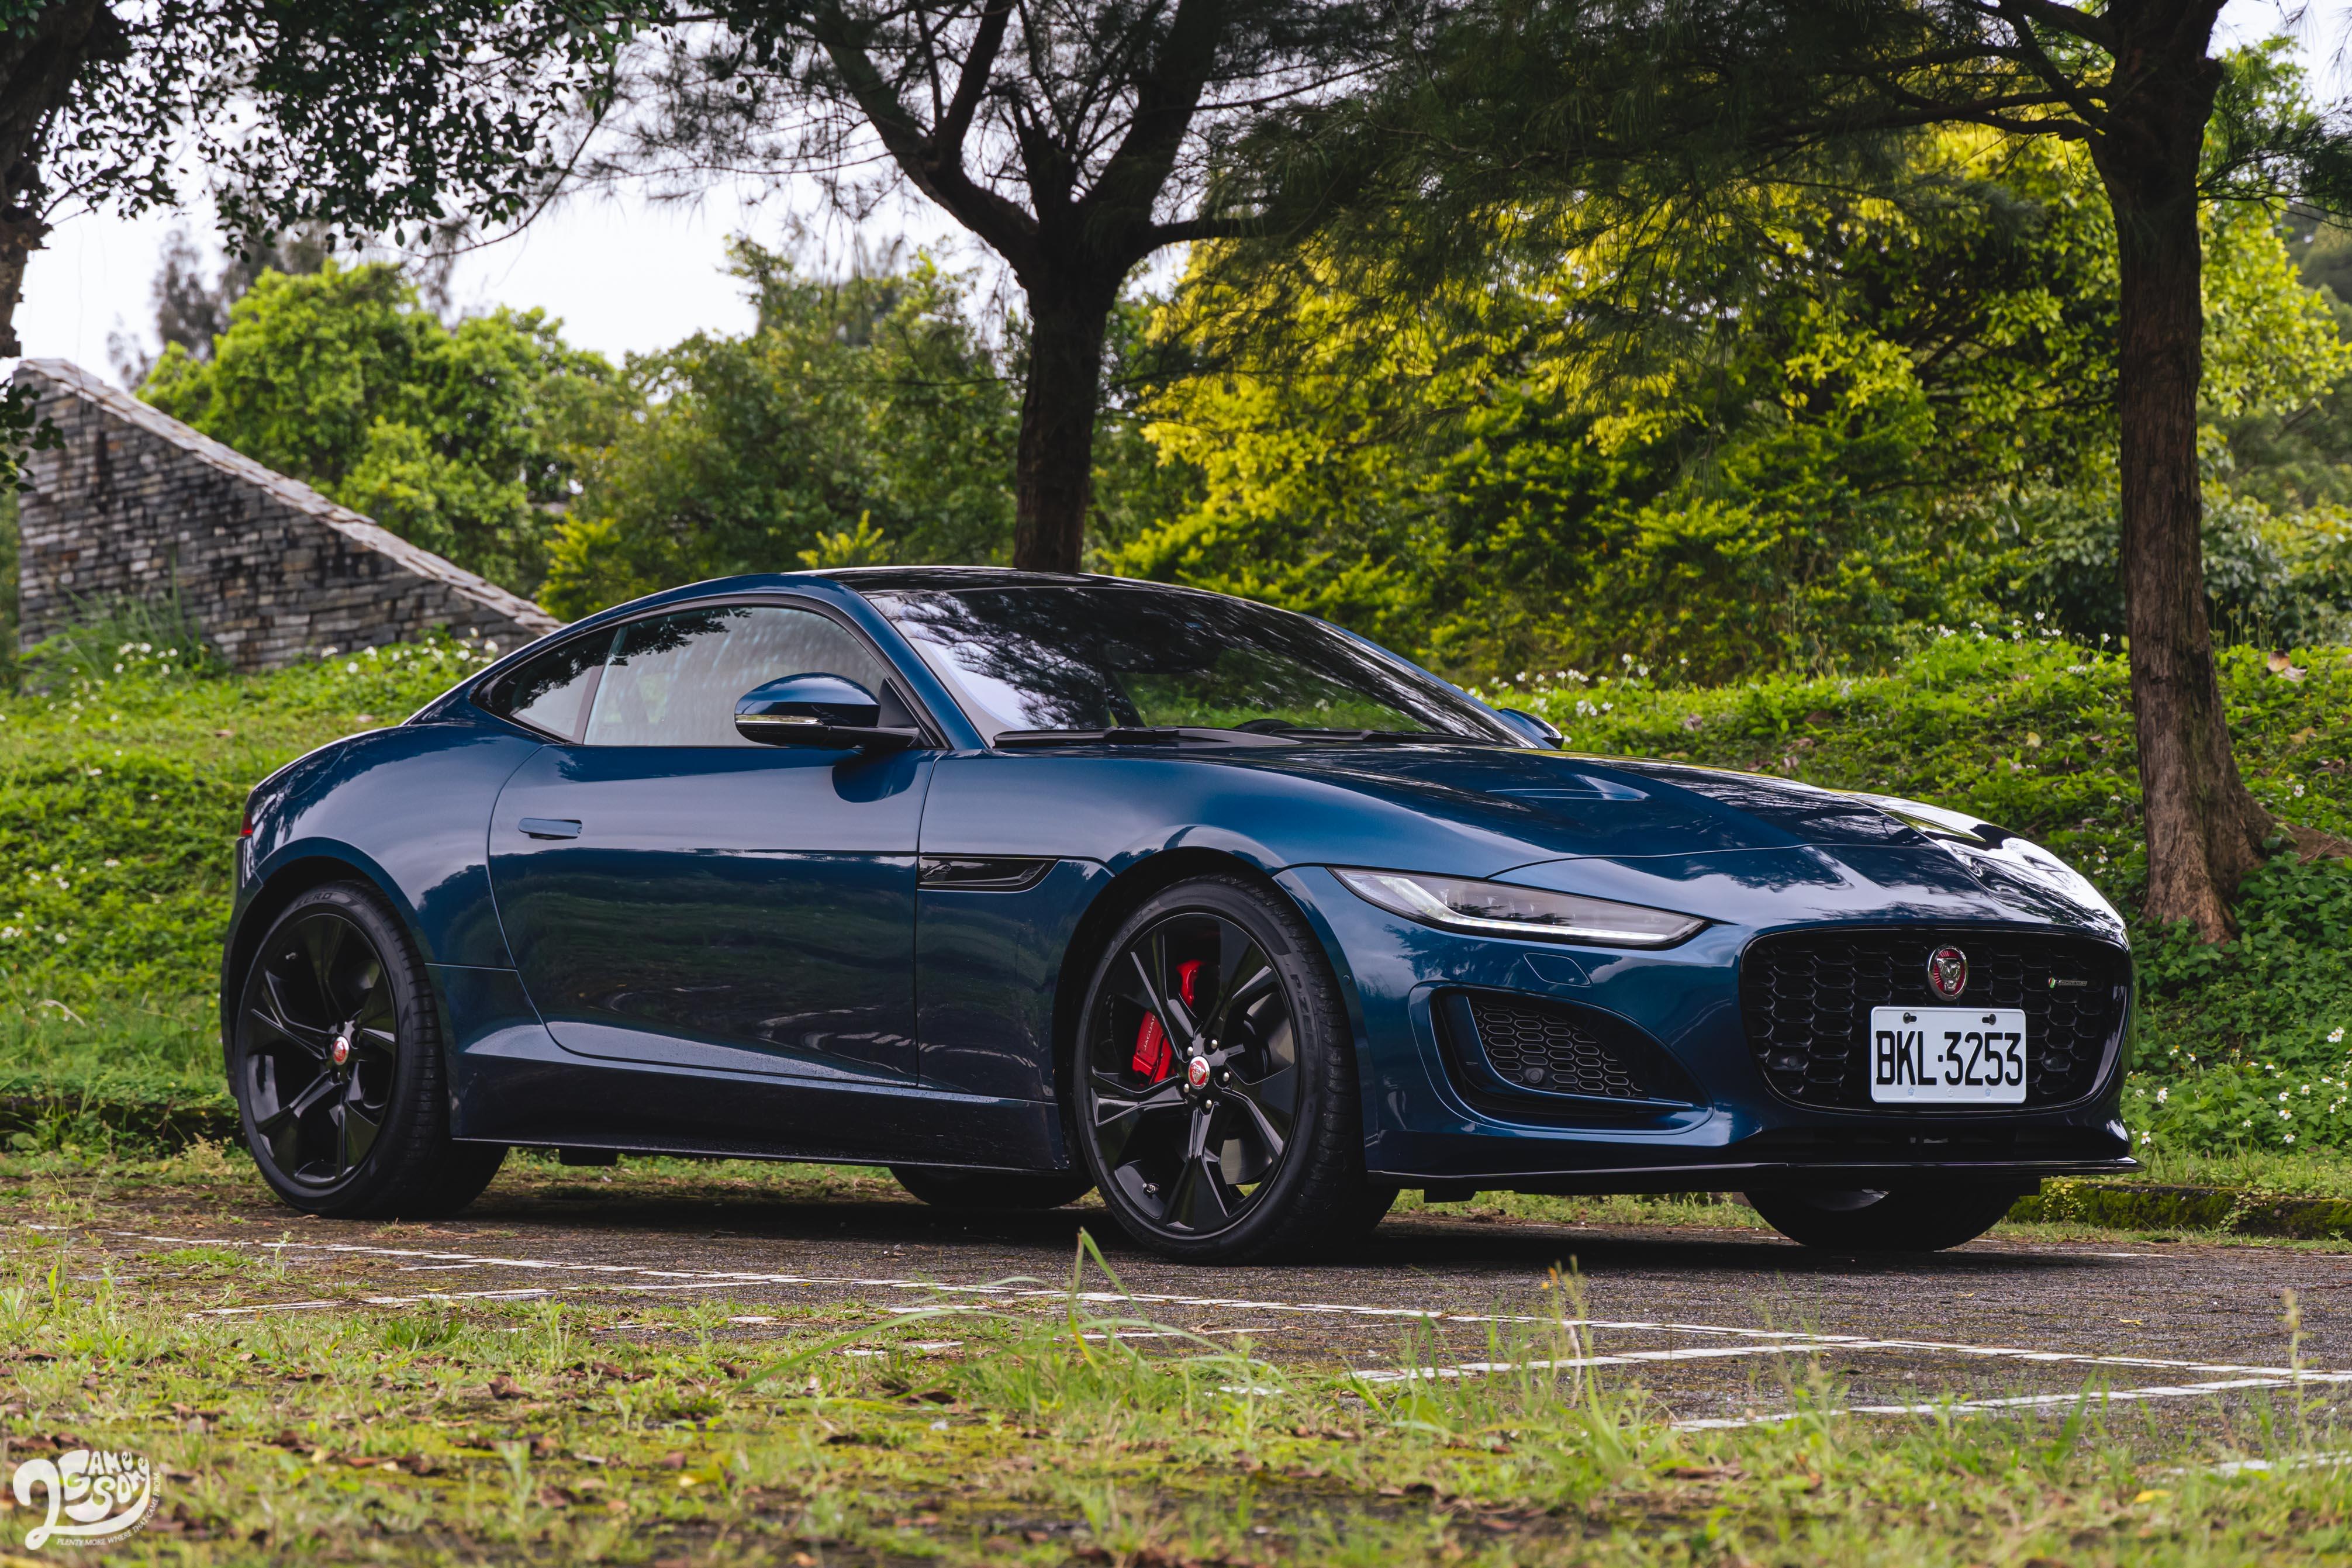 F-Type 擁有健壯肩線、長車頭短車尾黃金比例、豐腴的車尾線條。